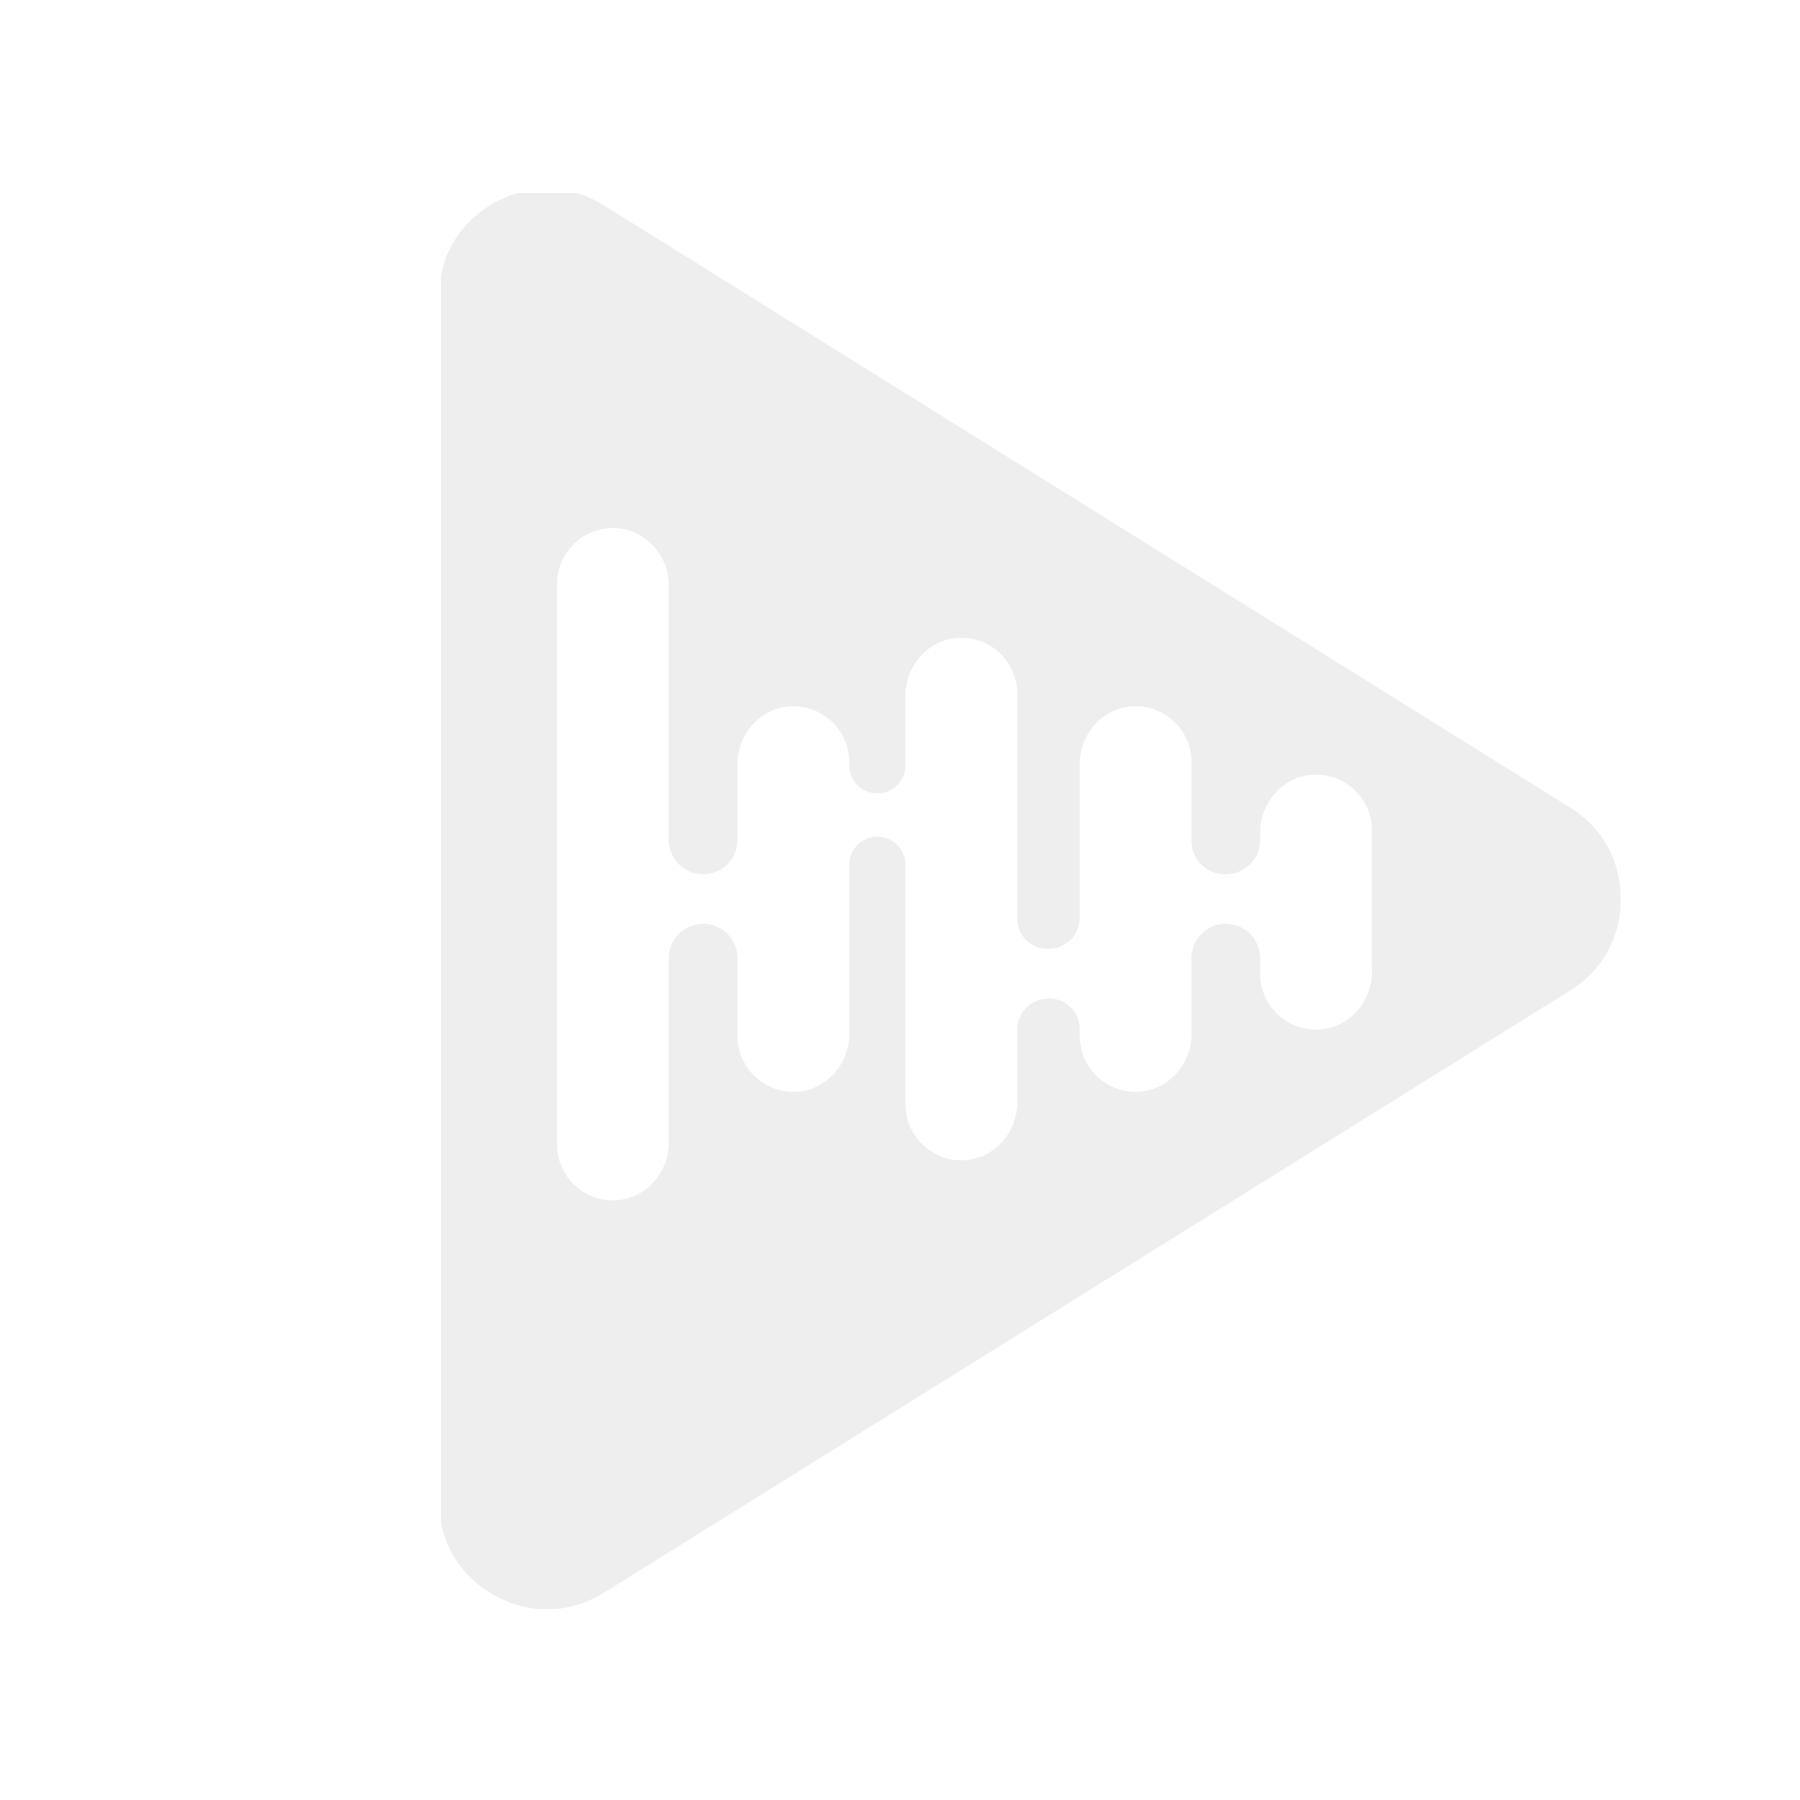 Phonocar VM268 - Biltilpasset ryggekamera